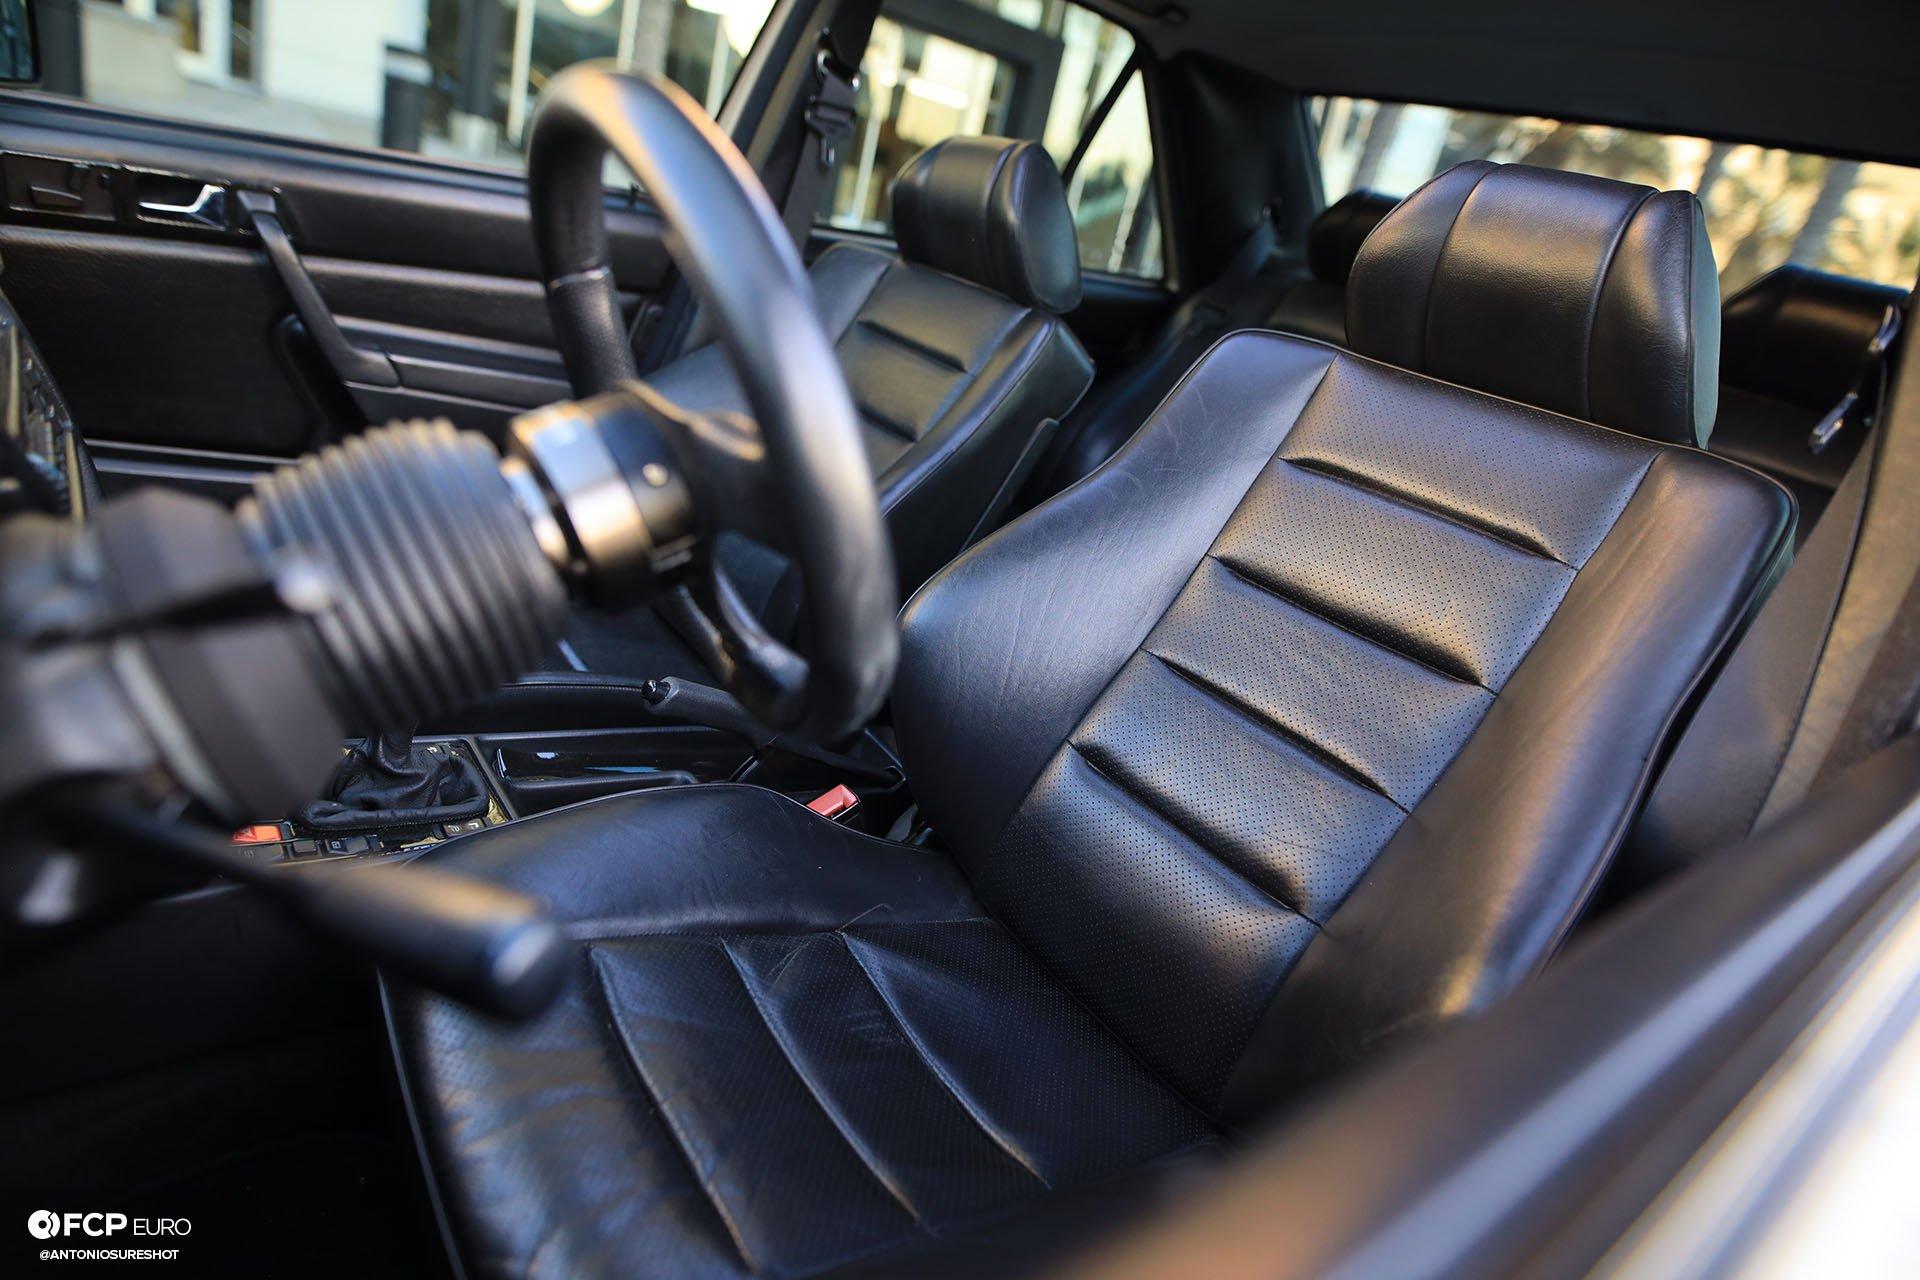 Mercedes Benz 190E 2.3 16v Cosworth EOSR1519